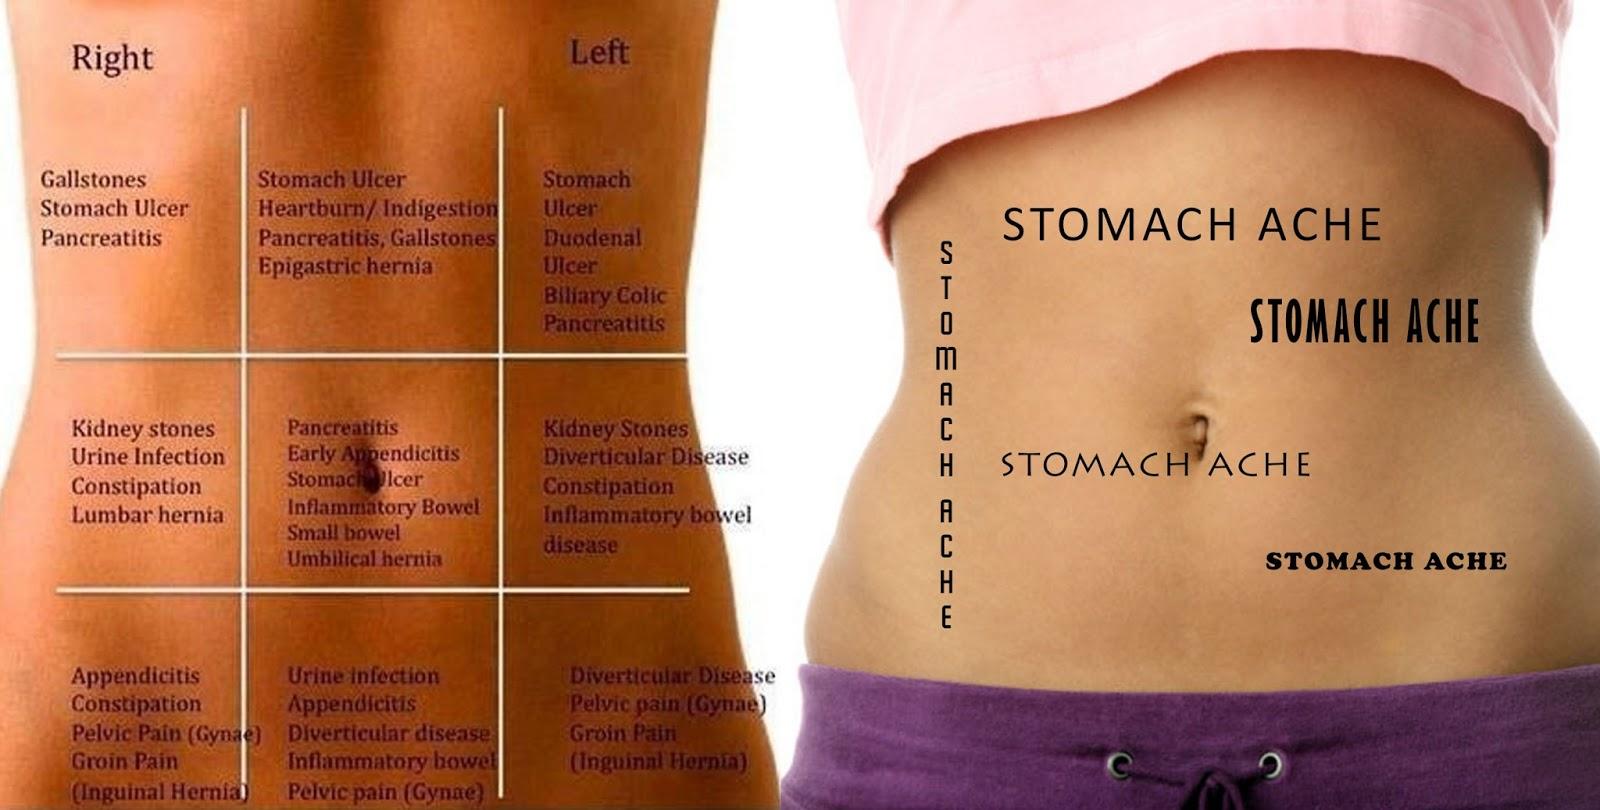 Pit Stop To Wonderland  Anatomy Of A Stomach Ache